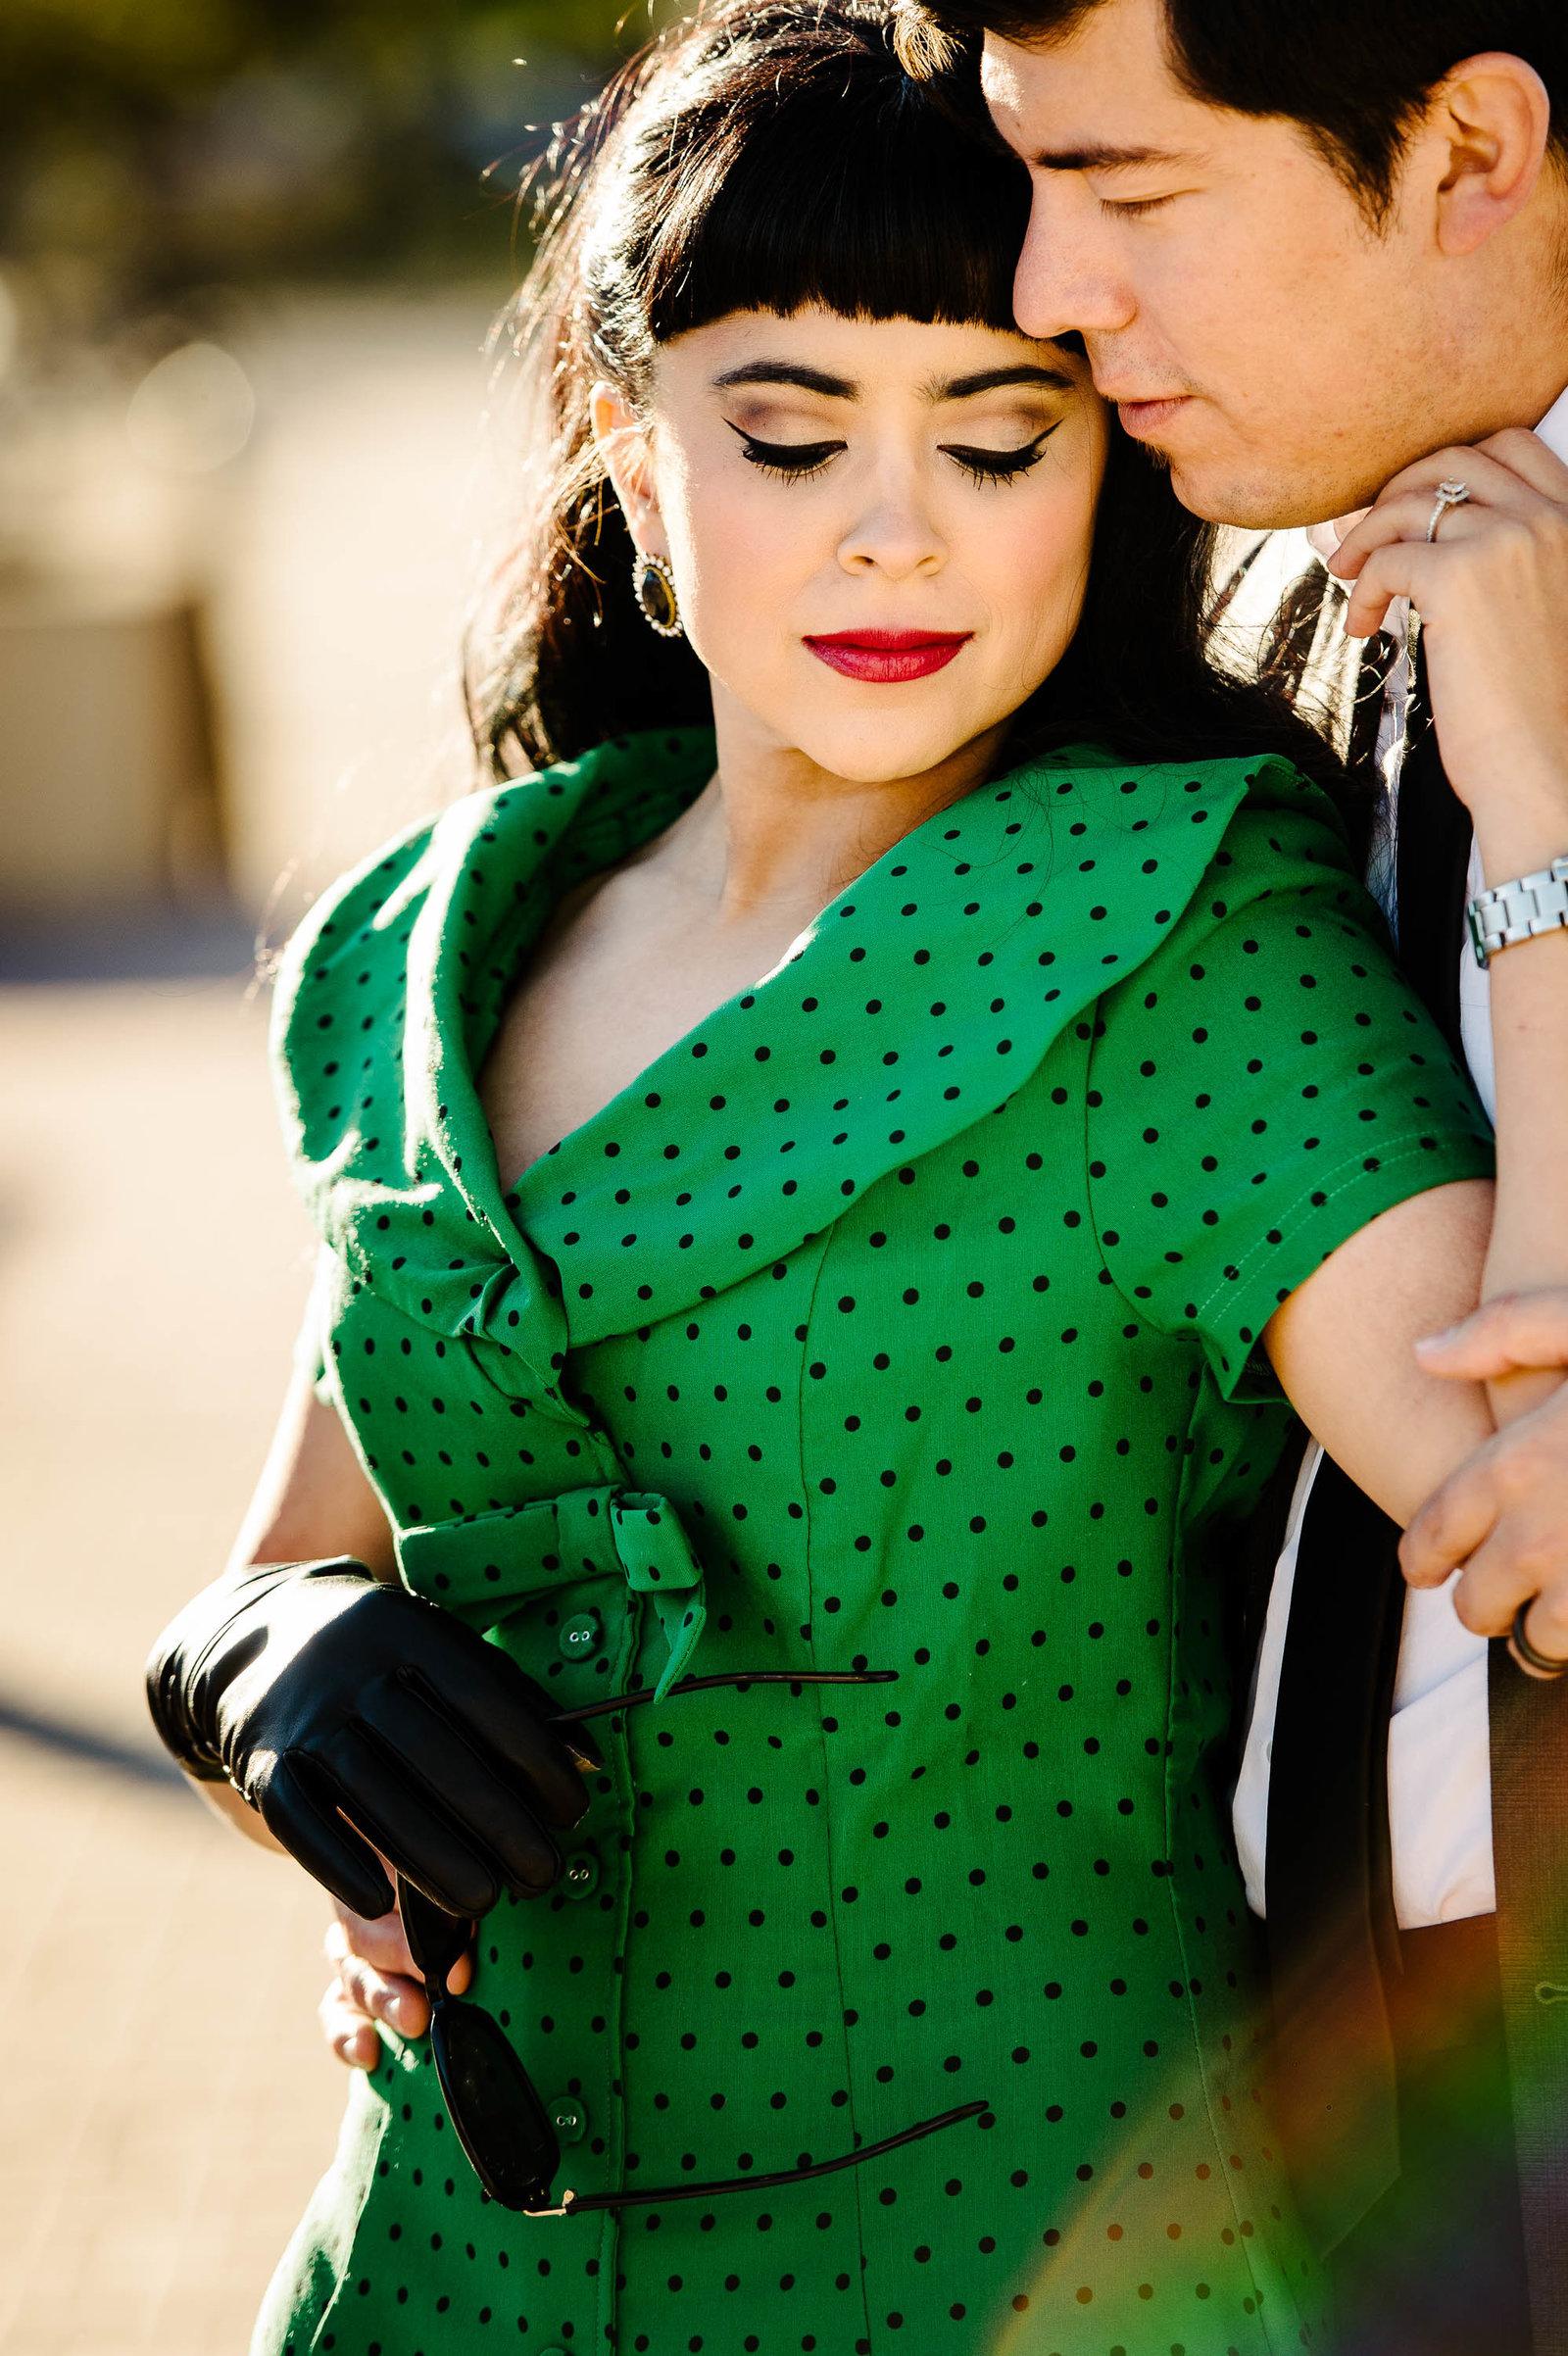 014-El-paso-wedding-photographer-El Paso Wedding Photographer_E48